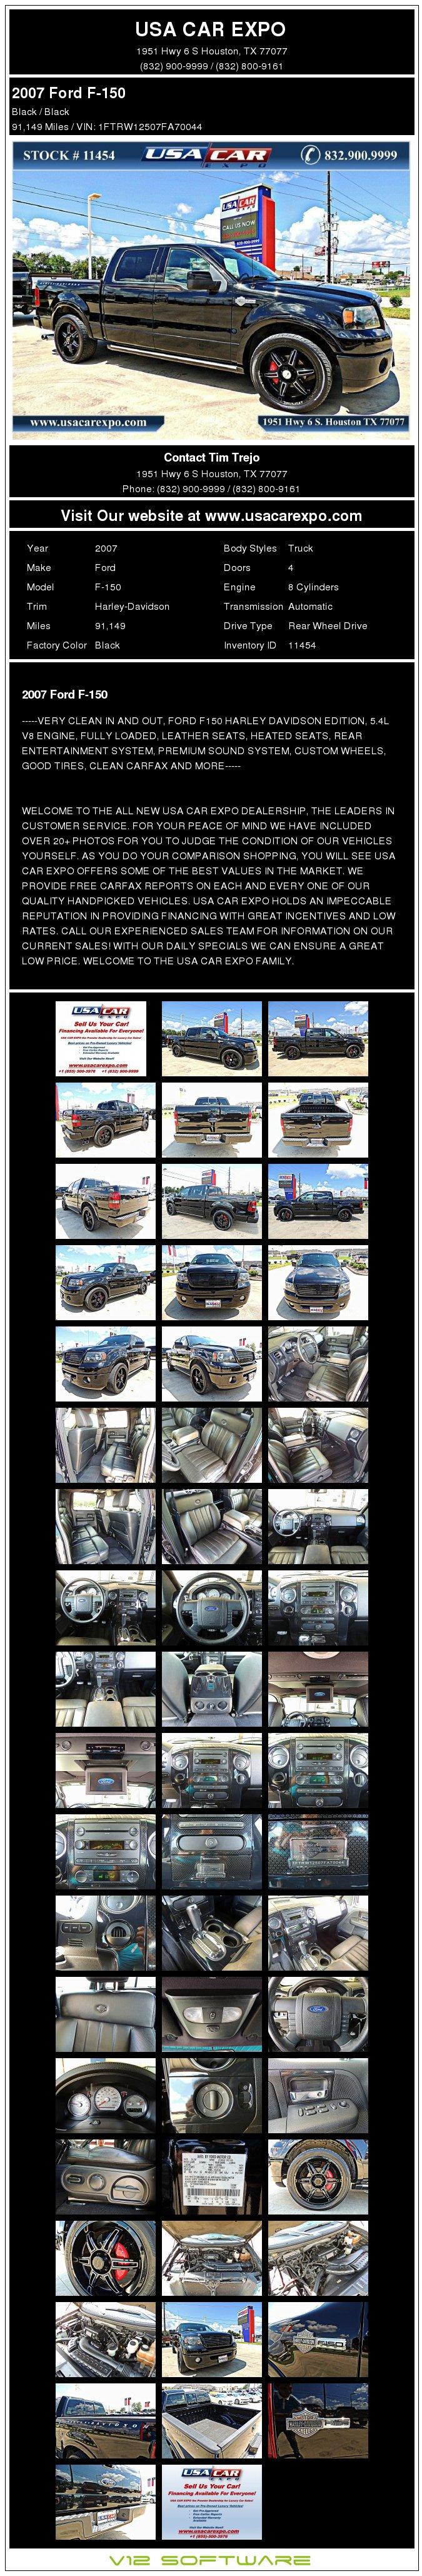 $18,900, 2007 Ford F-150 Harley-davidson